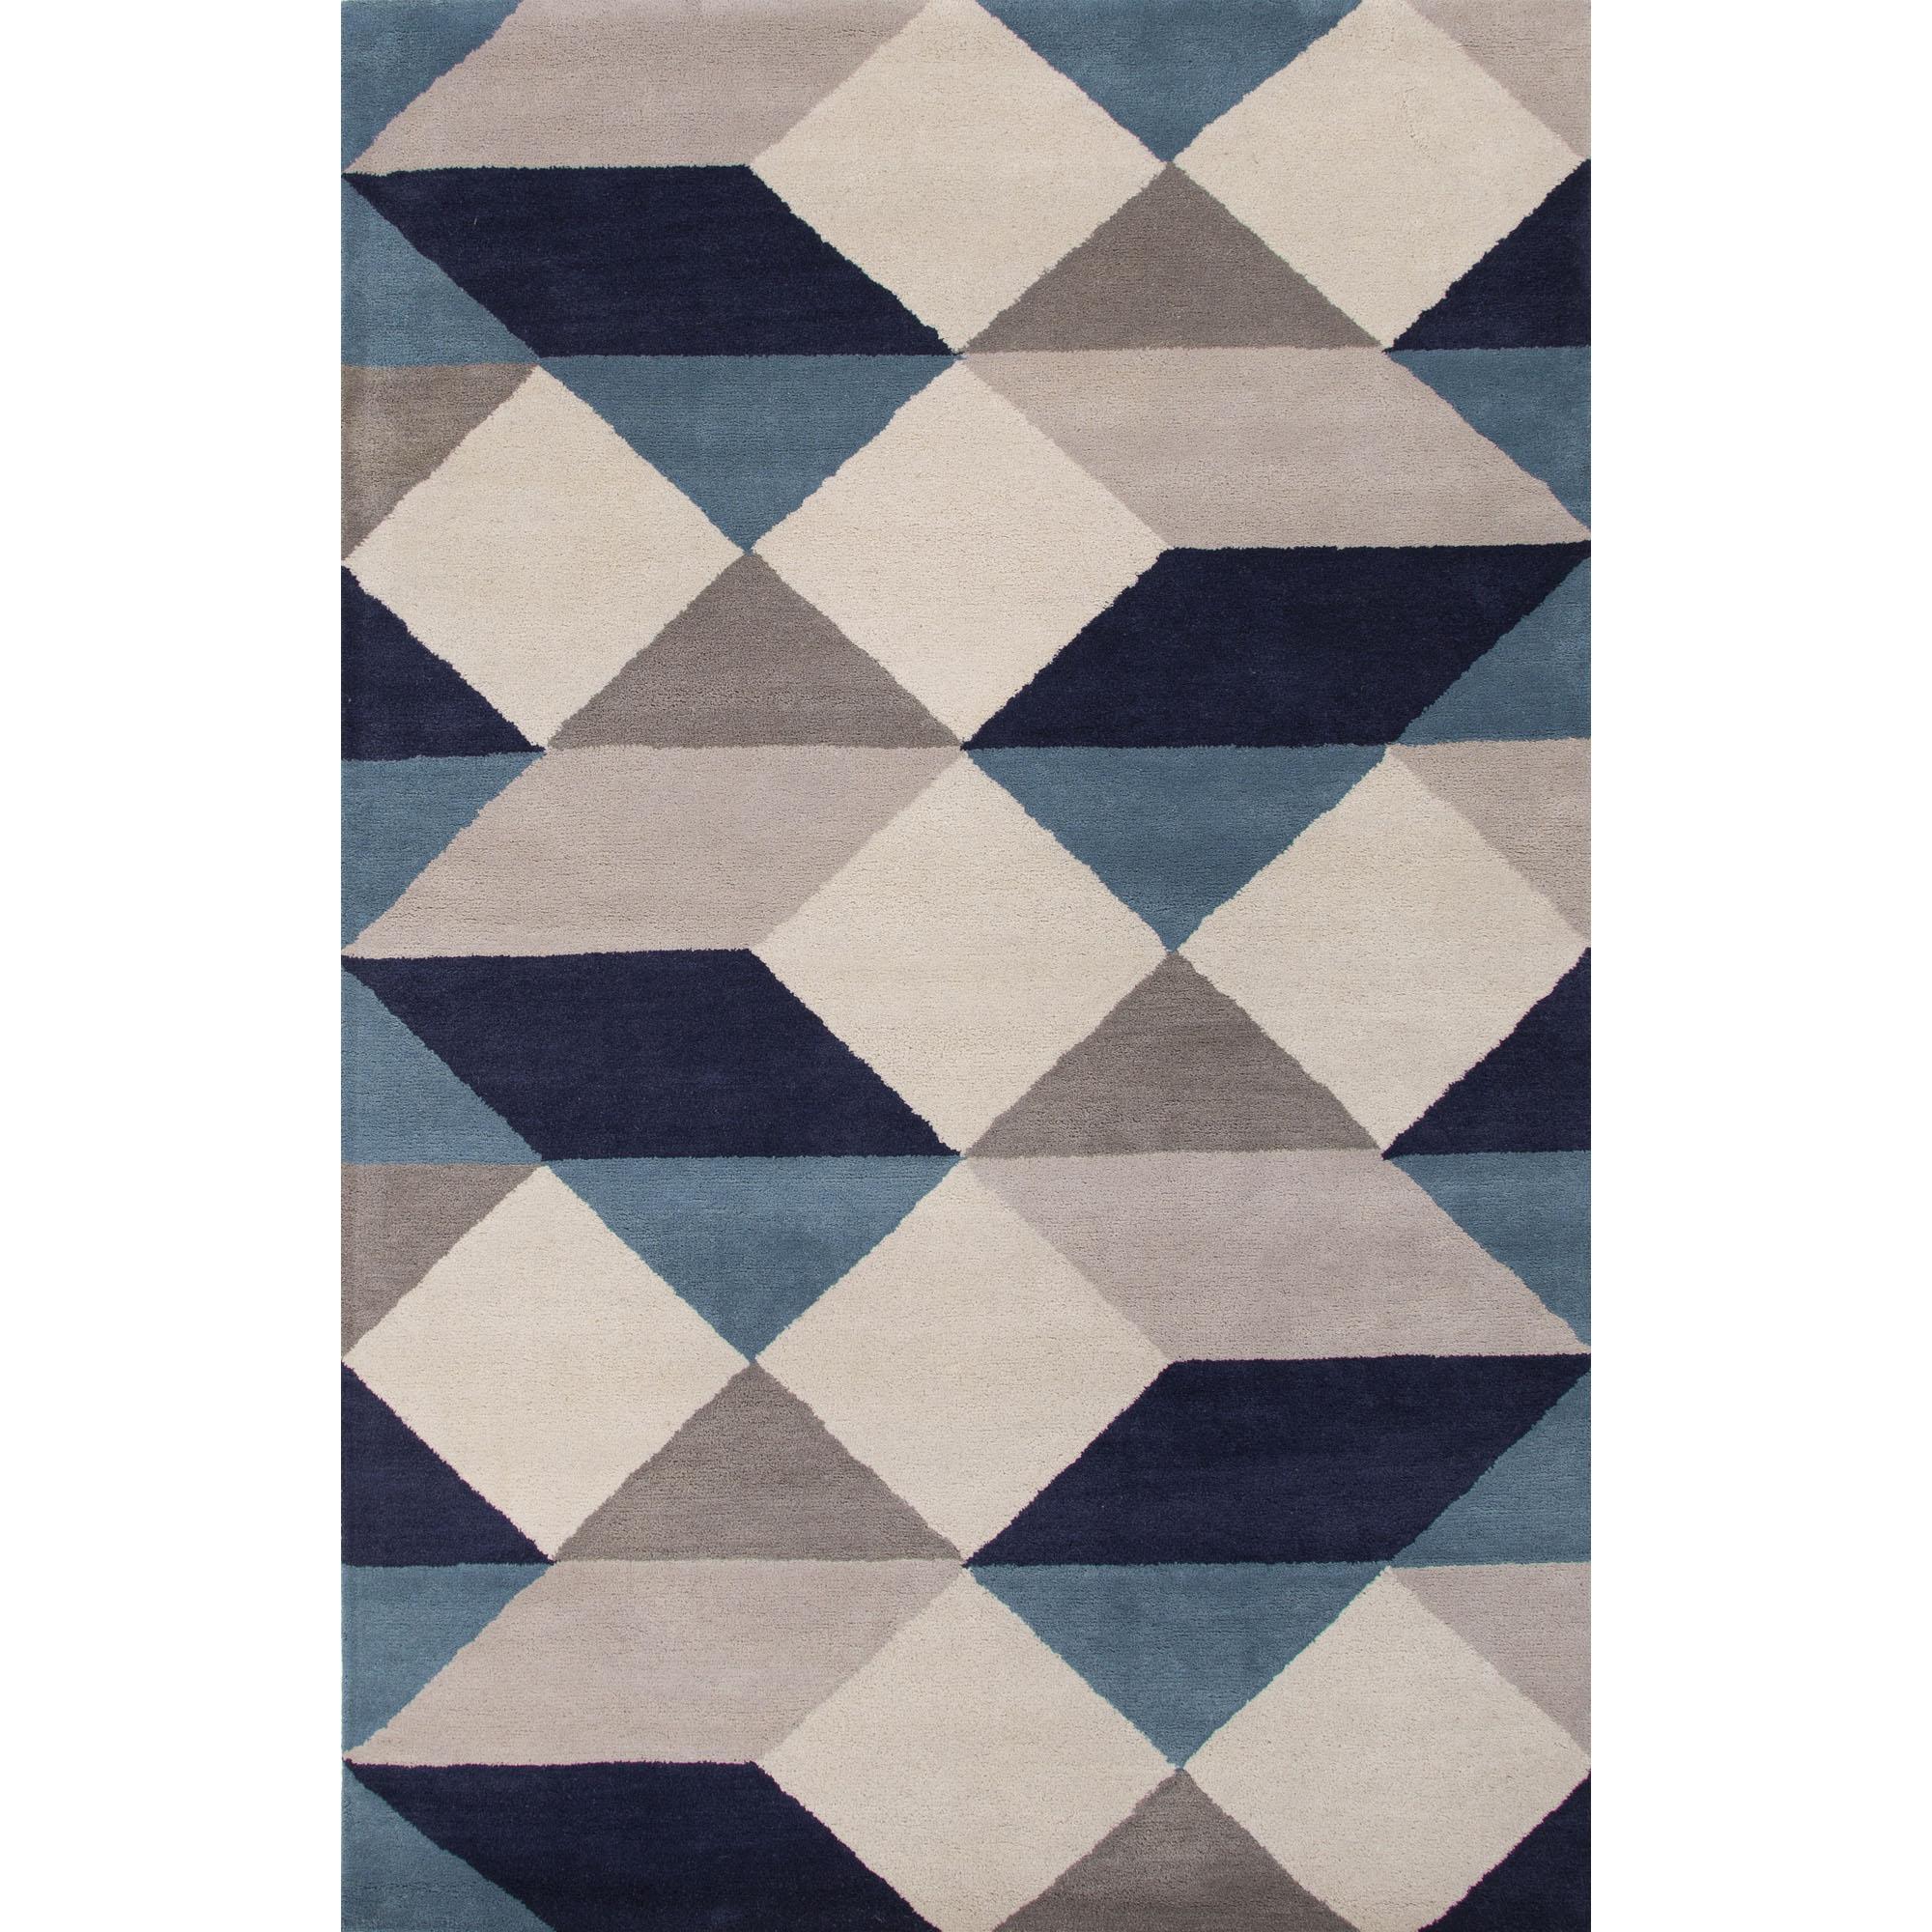 JAIPUR Rugs En Casa By Luli Sanchez Tufted 8 x 11 Rug - Item Number: RUG116797